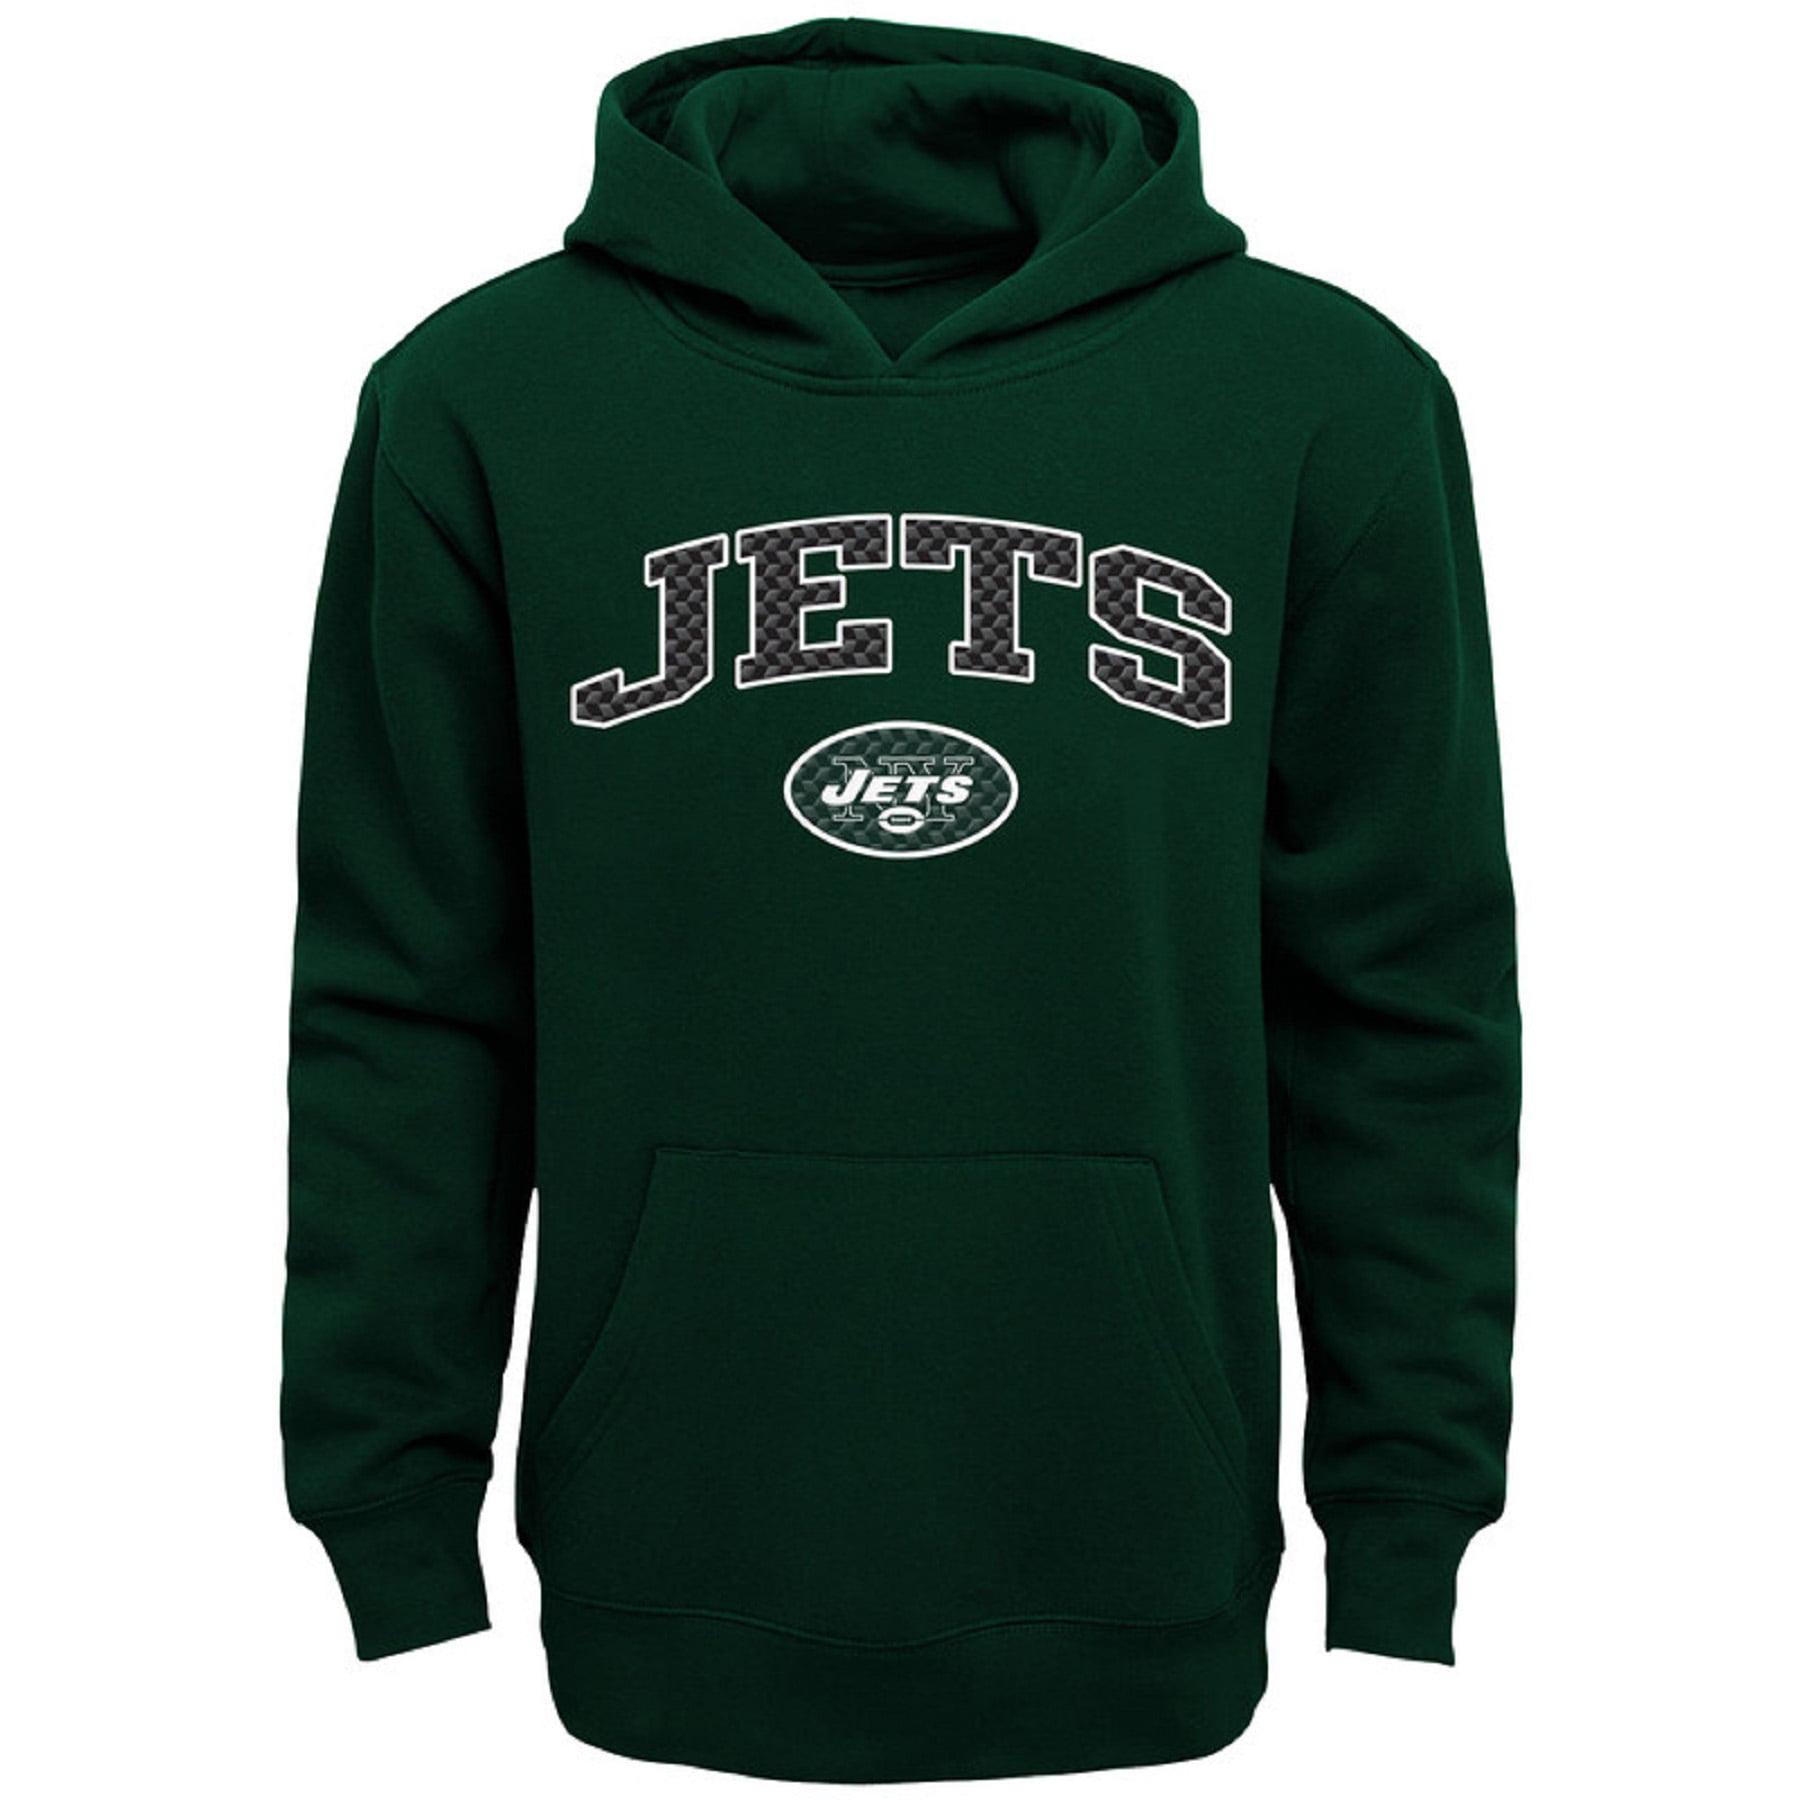 Youth Green New York Jets Clear Gel Fleece Hoodie